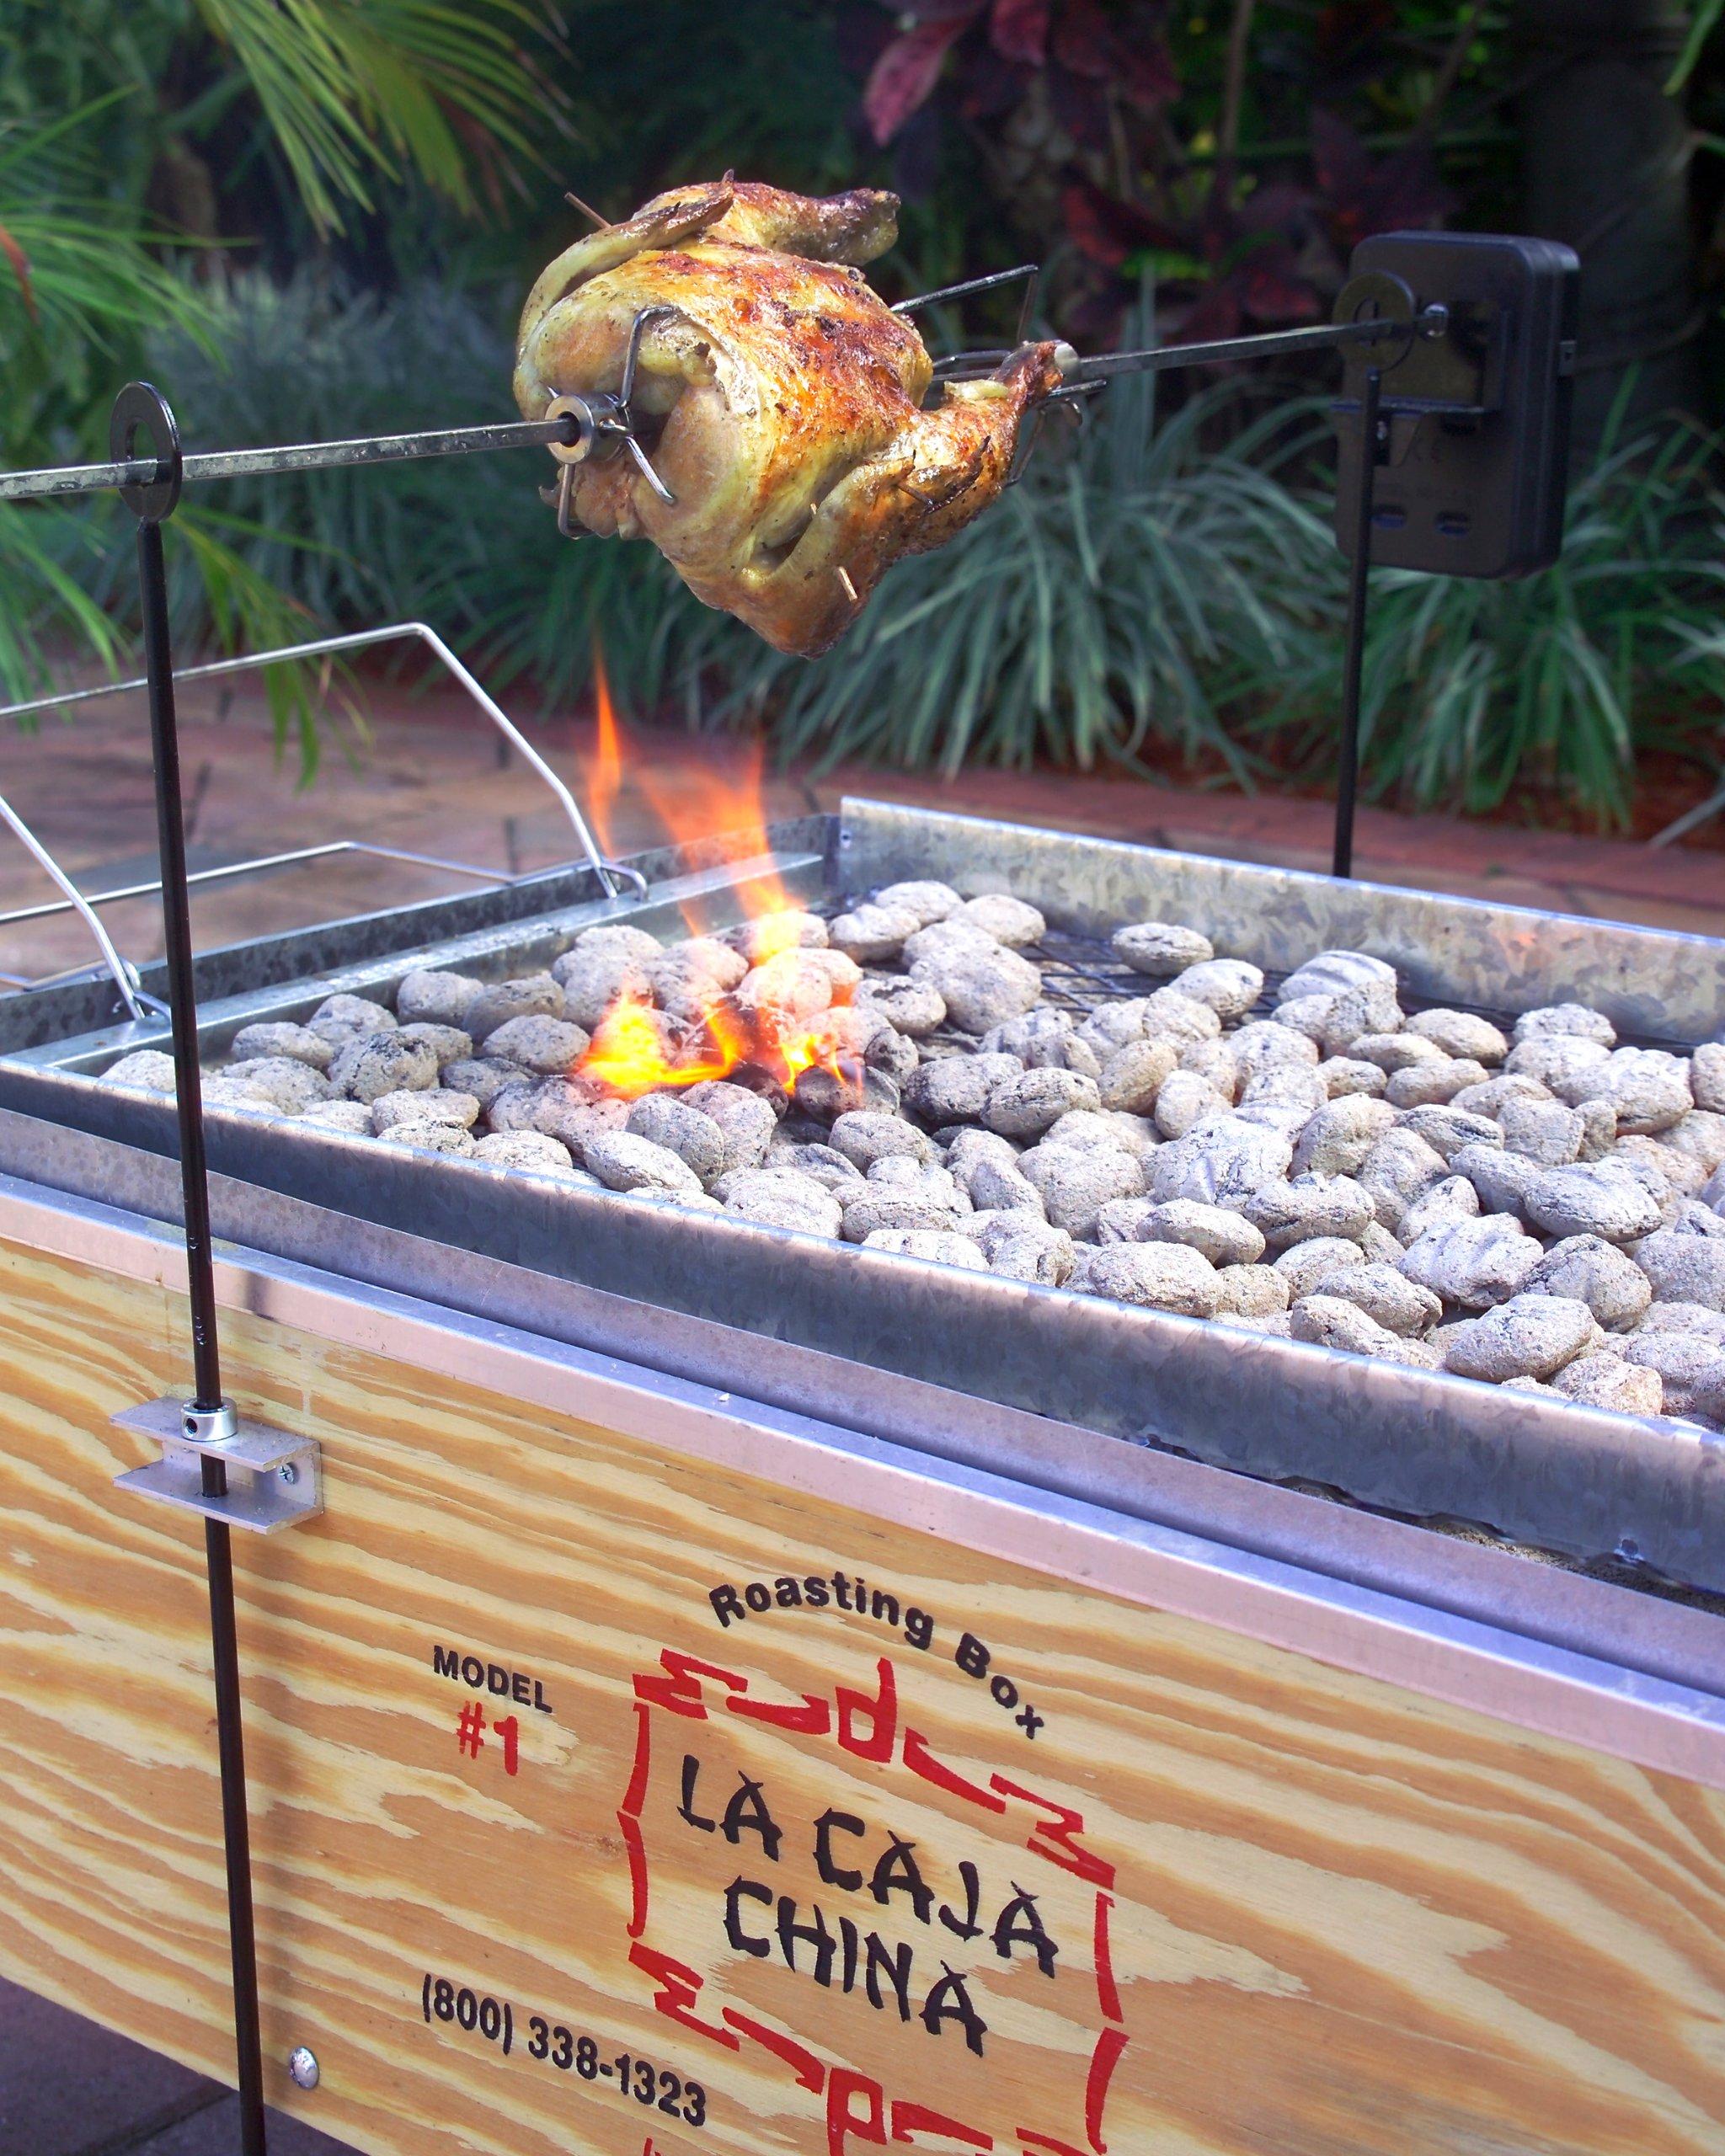 La Caja China Rotisserie Kit by La Caja China